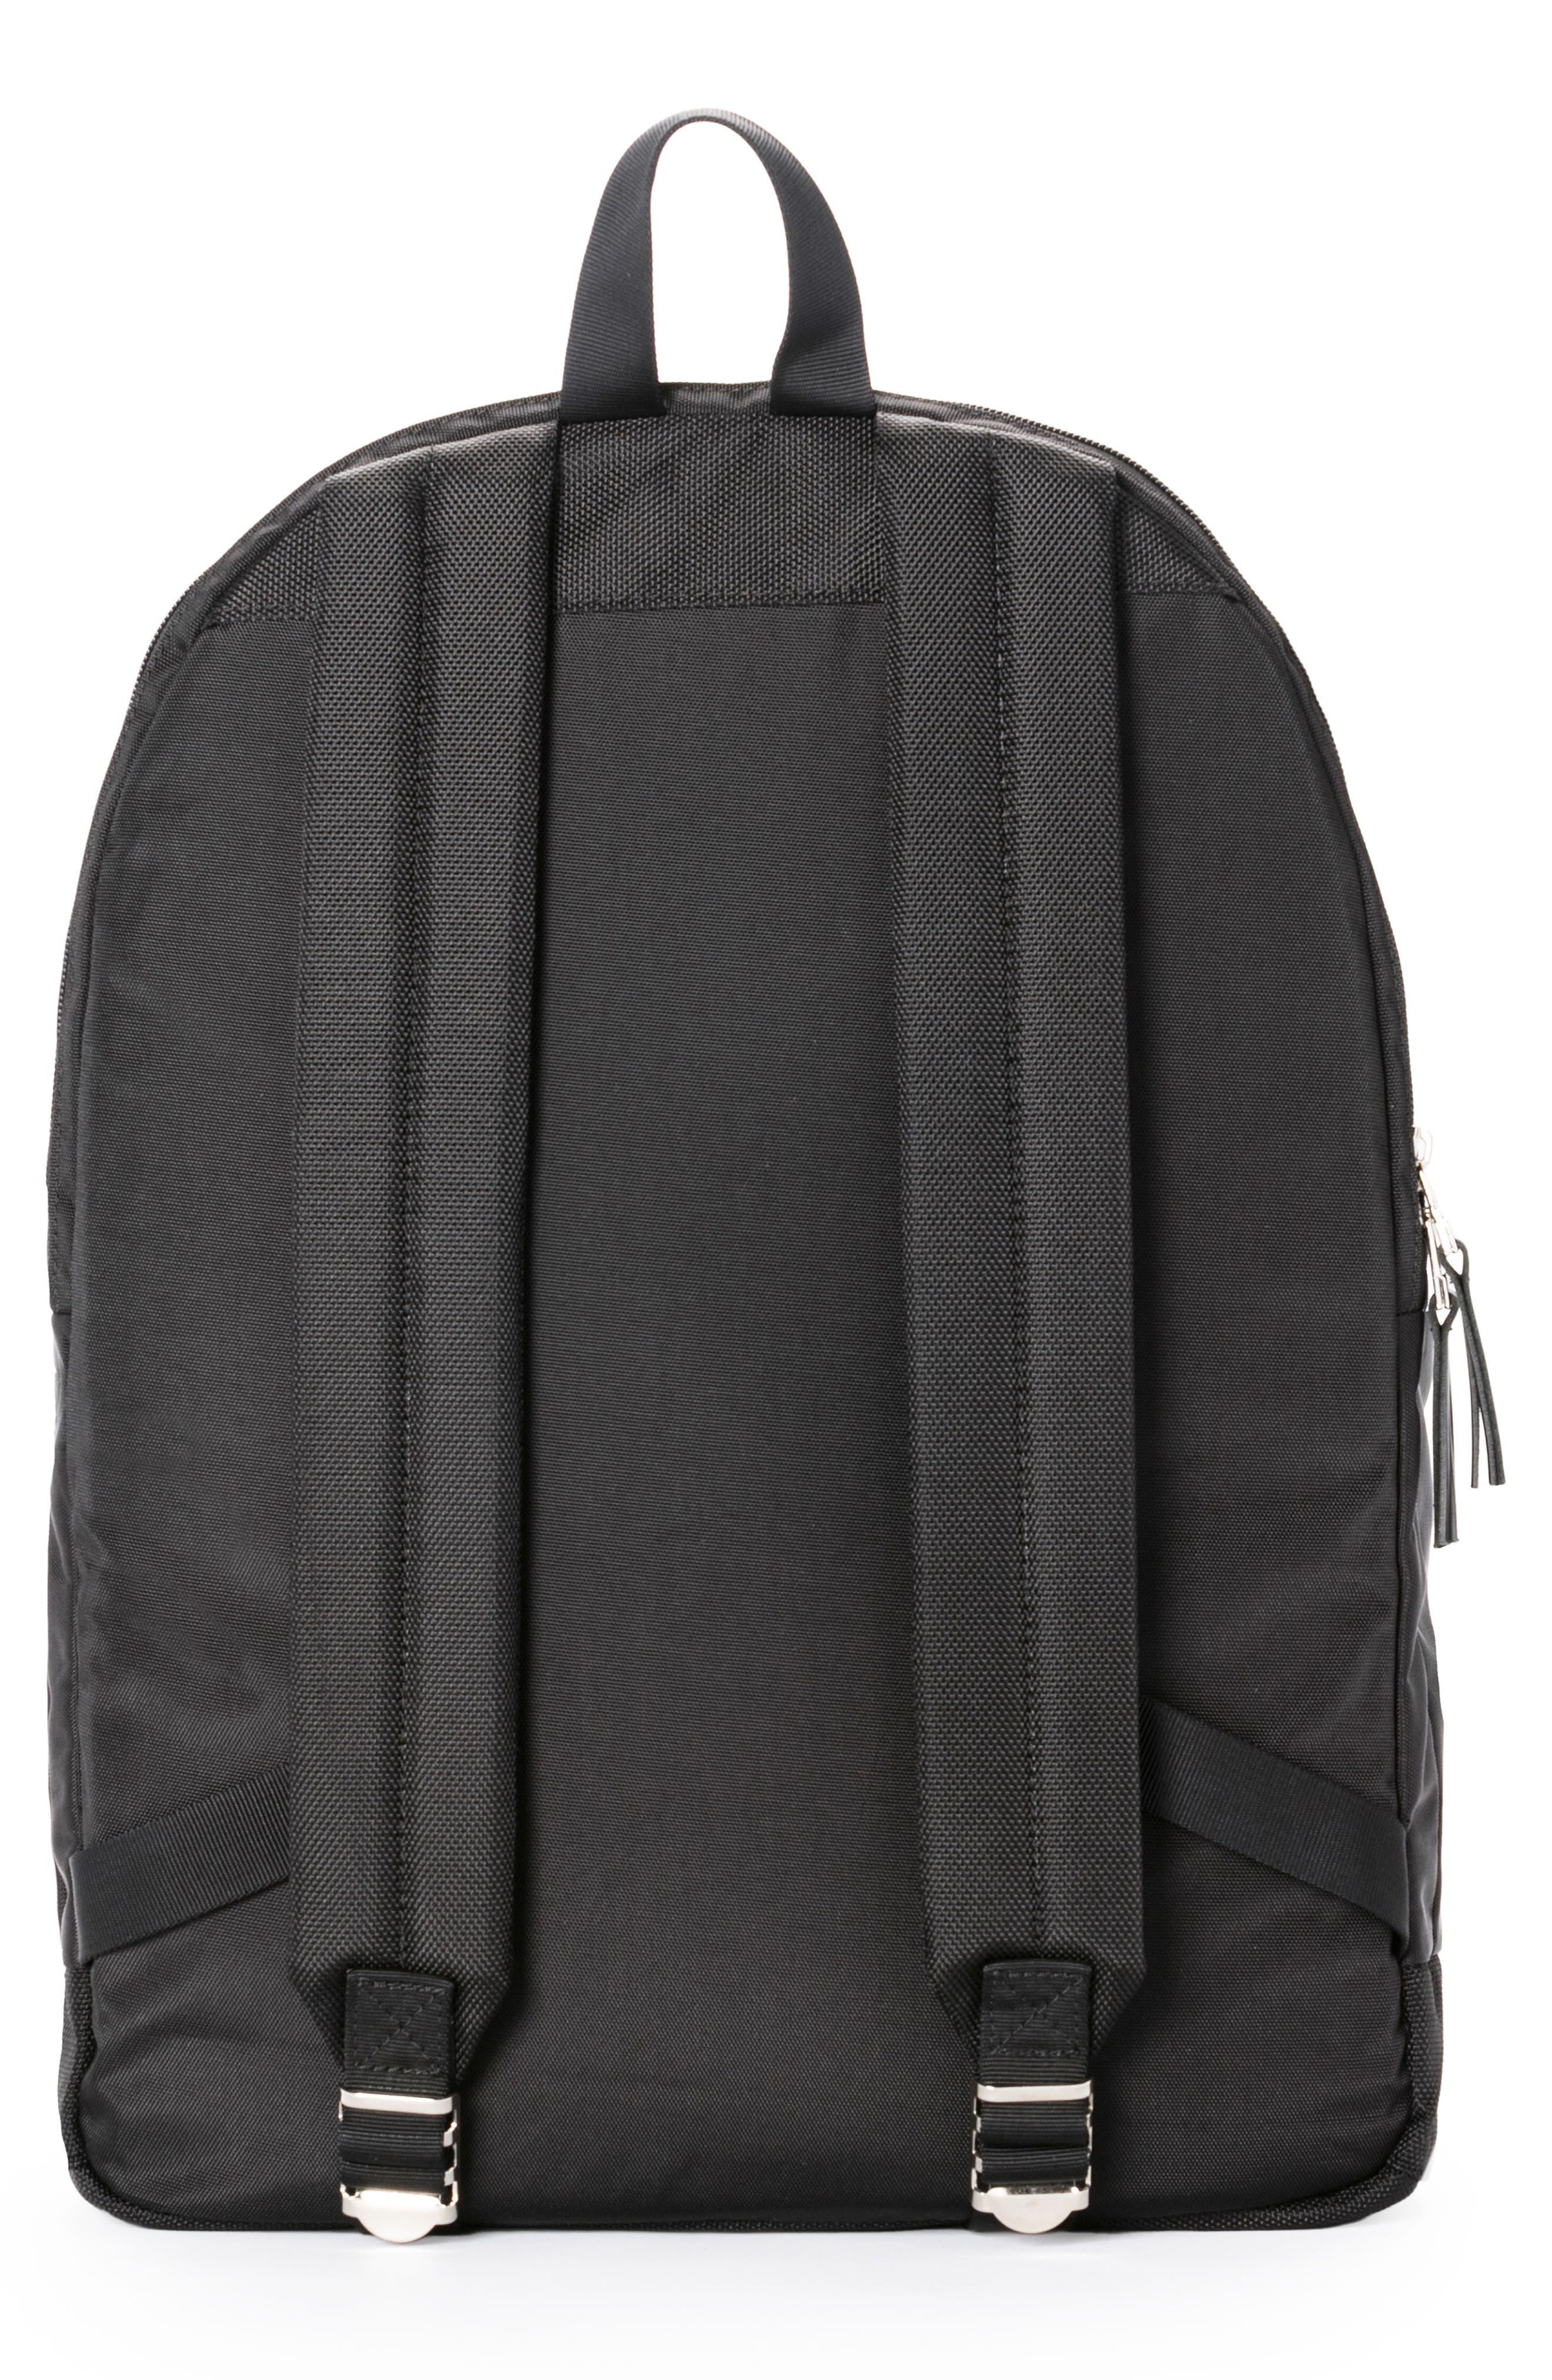 TAIKAN,                             Lancer Backpack,                             Alternate thumbnail 2, color,                             001